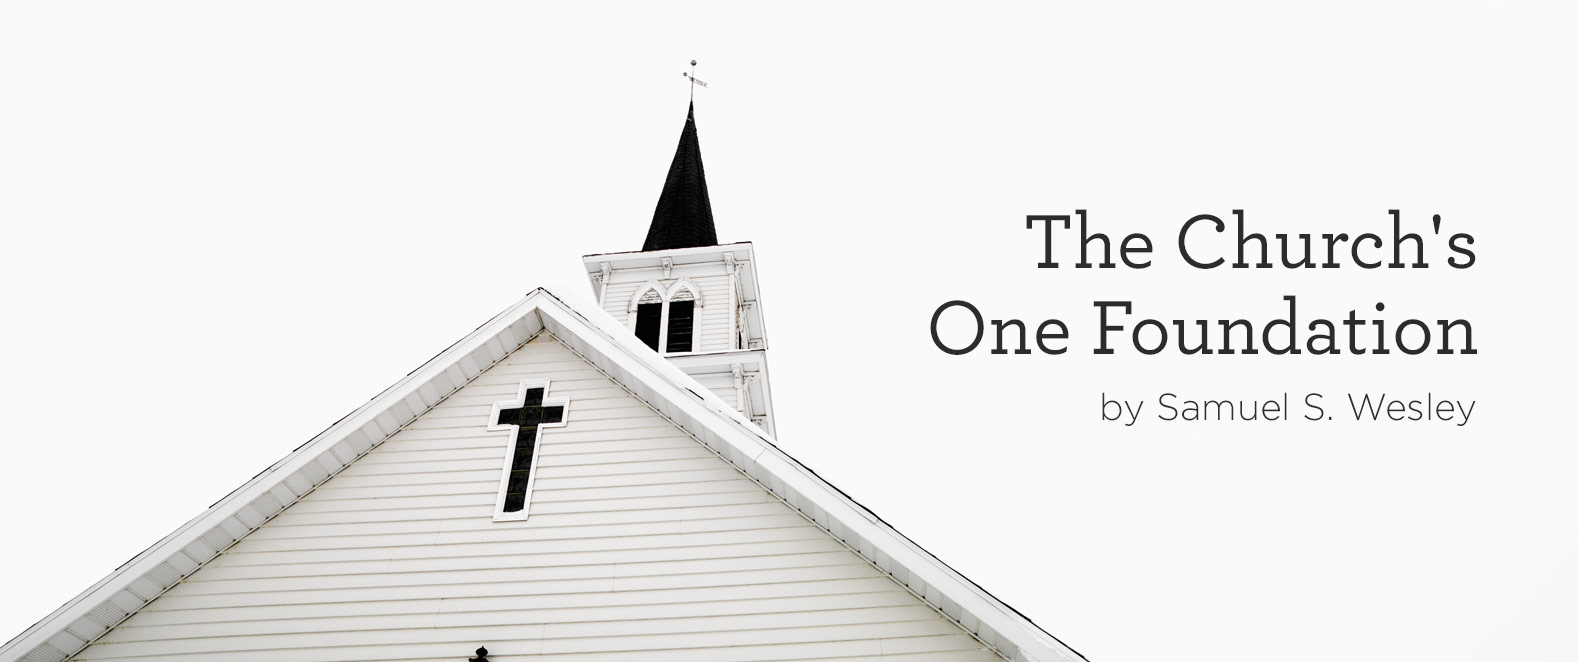 The Churchs One Foundation